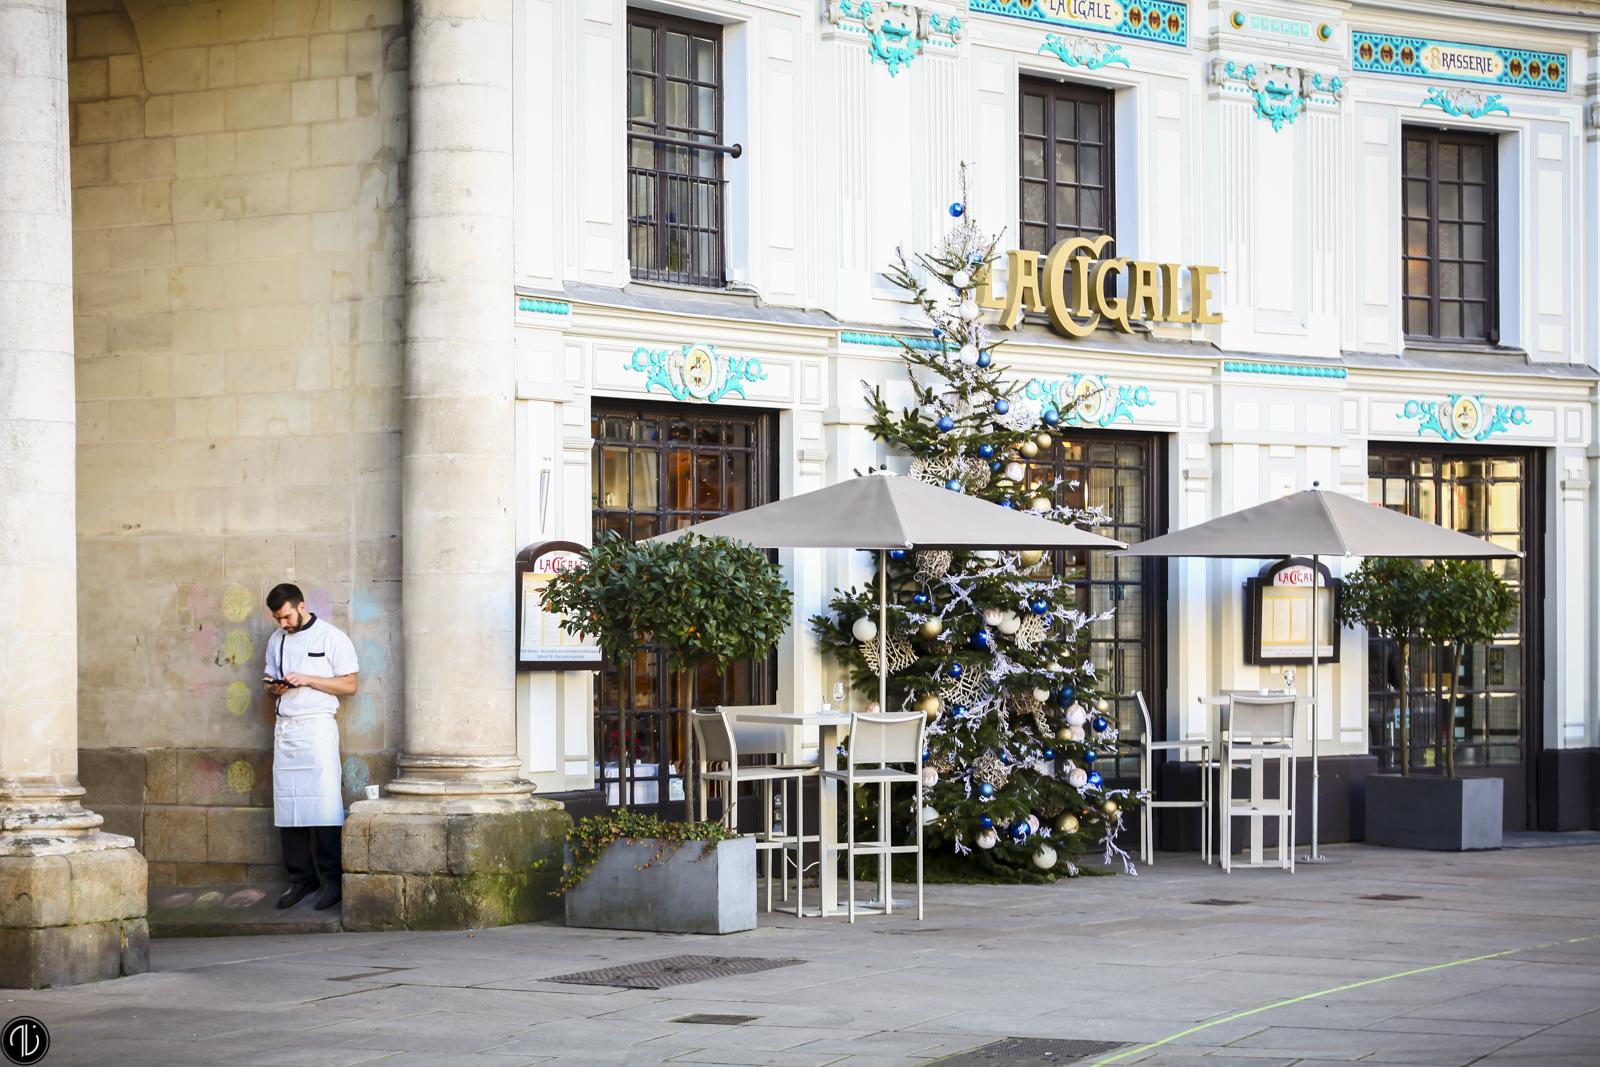 La Cigale Brasserie